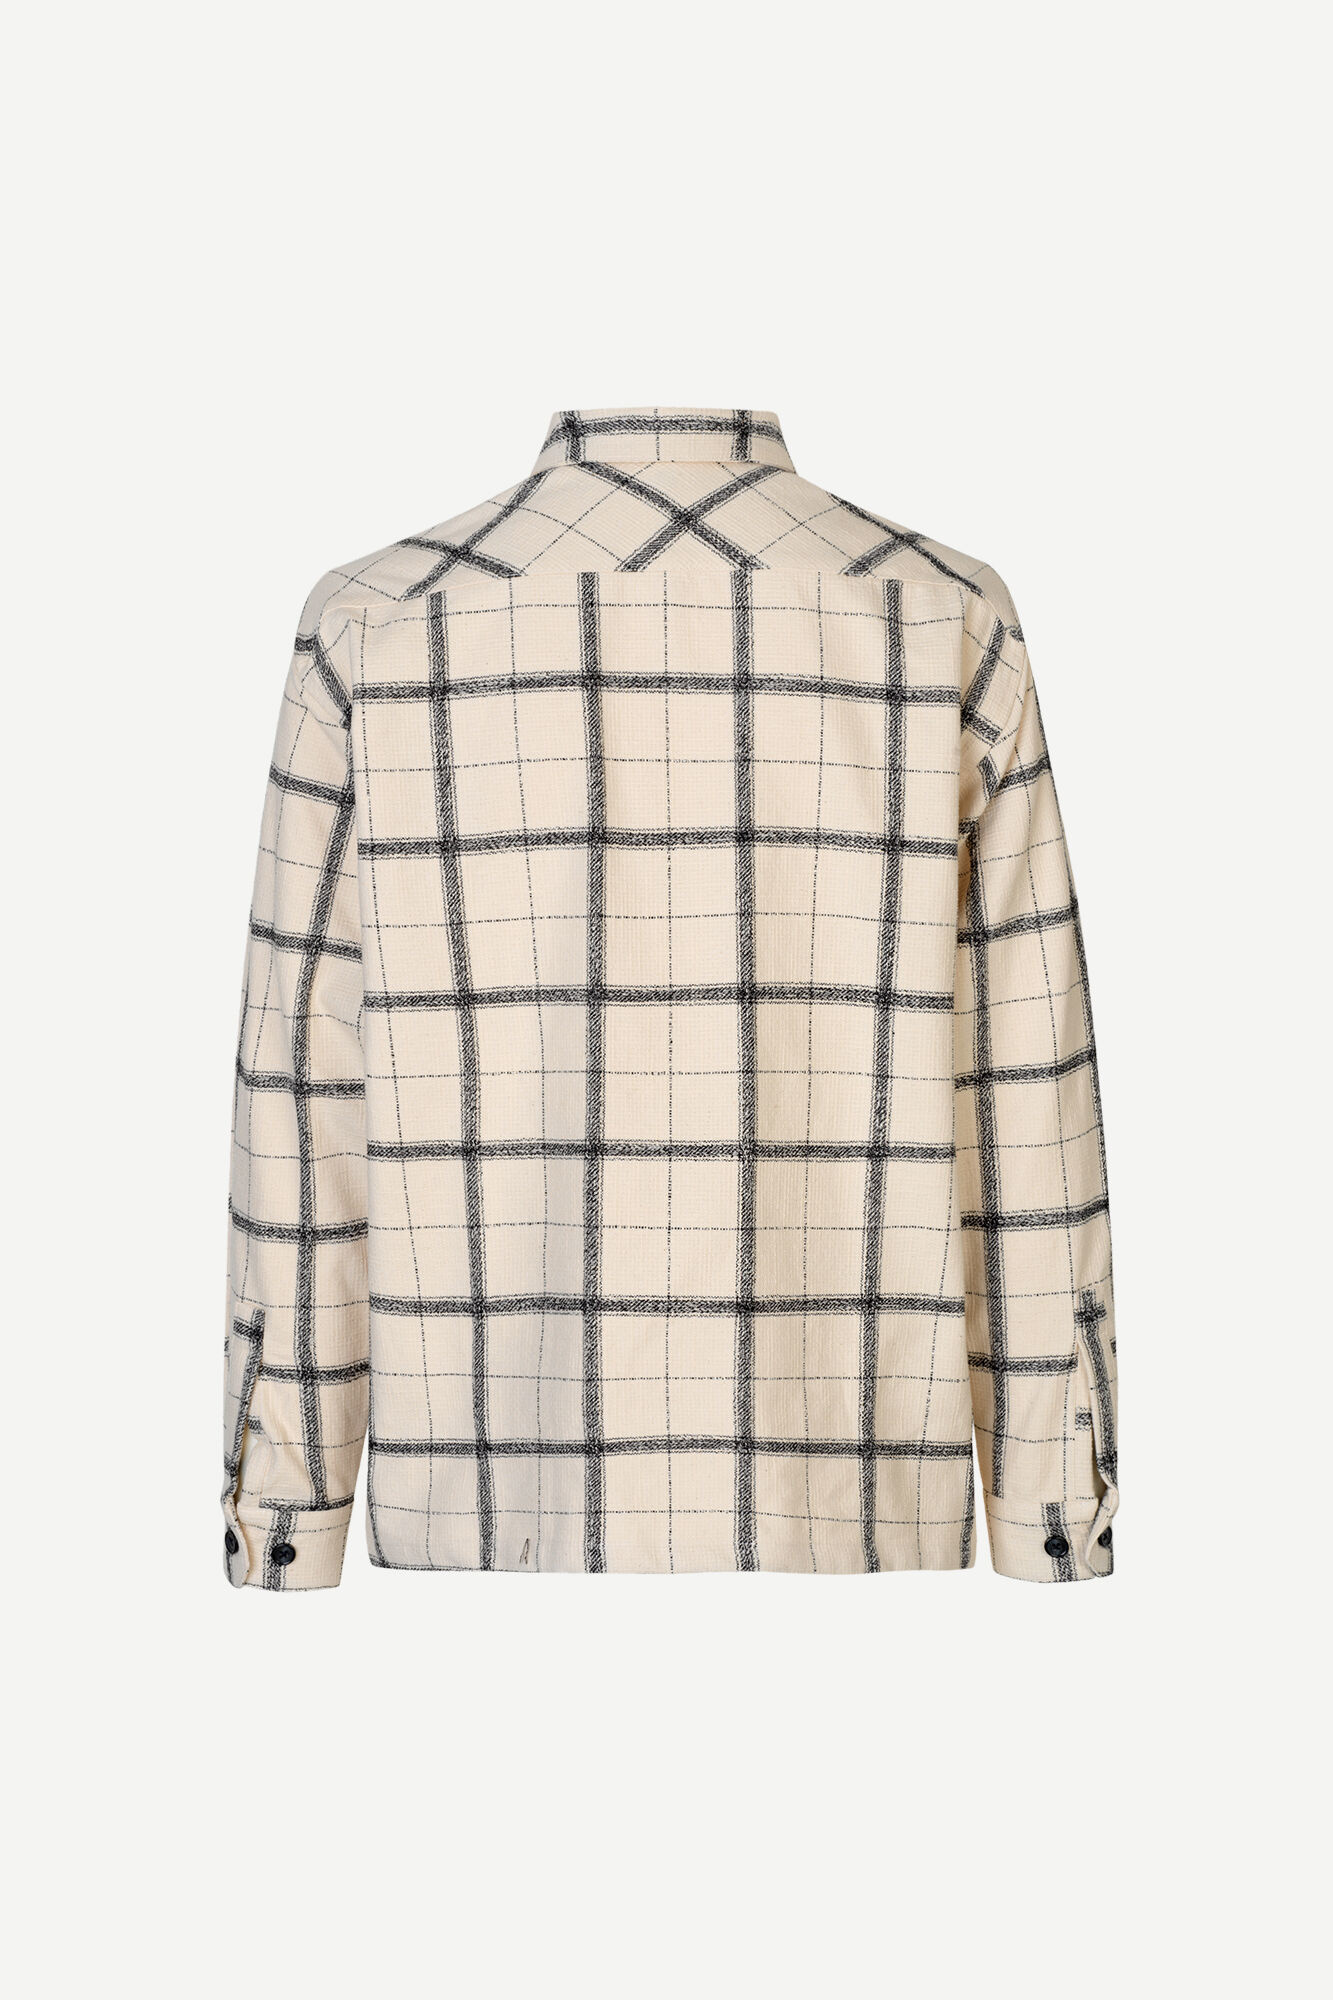 Castor Checker Overhemd Crème Wit 14046-3